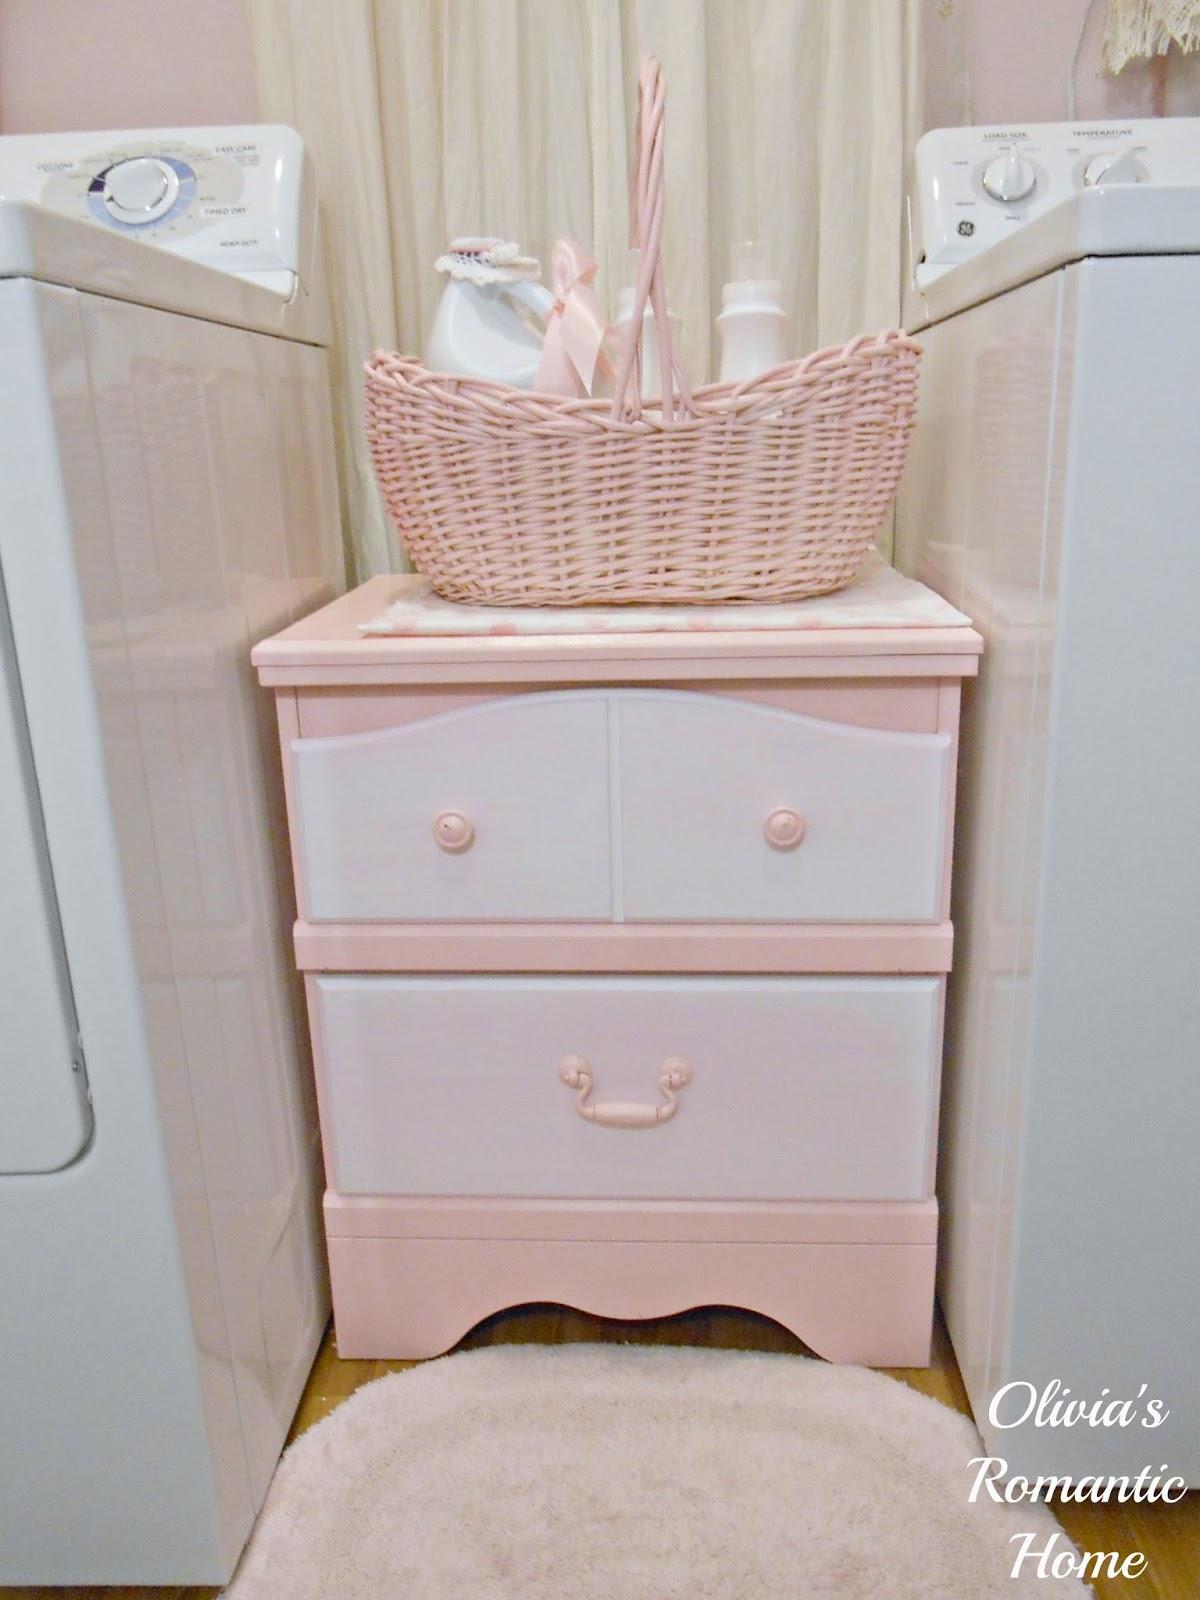 Pink Bedside Table: Olivia's Romantic Home: Bedside Table Turned Laundry Hamper